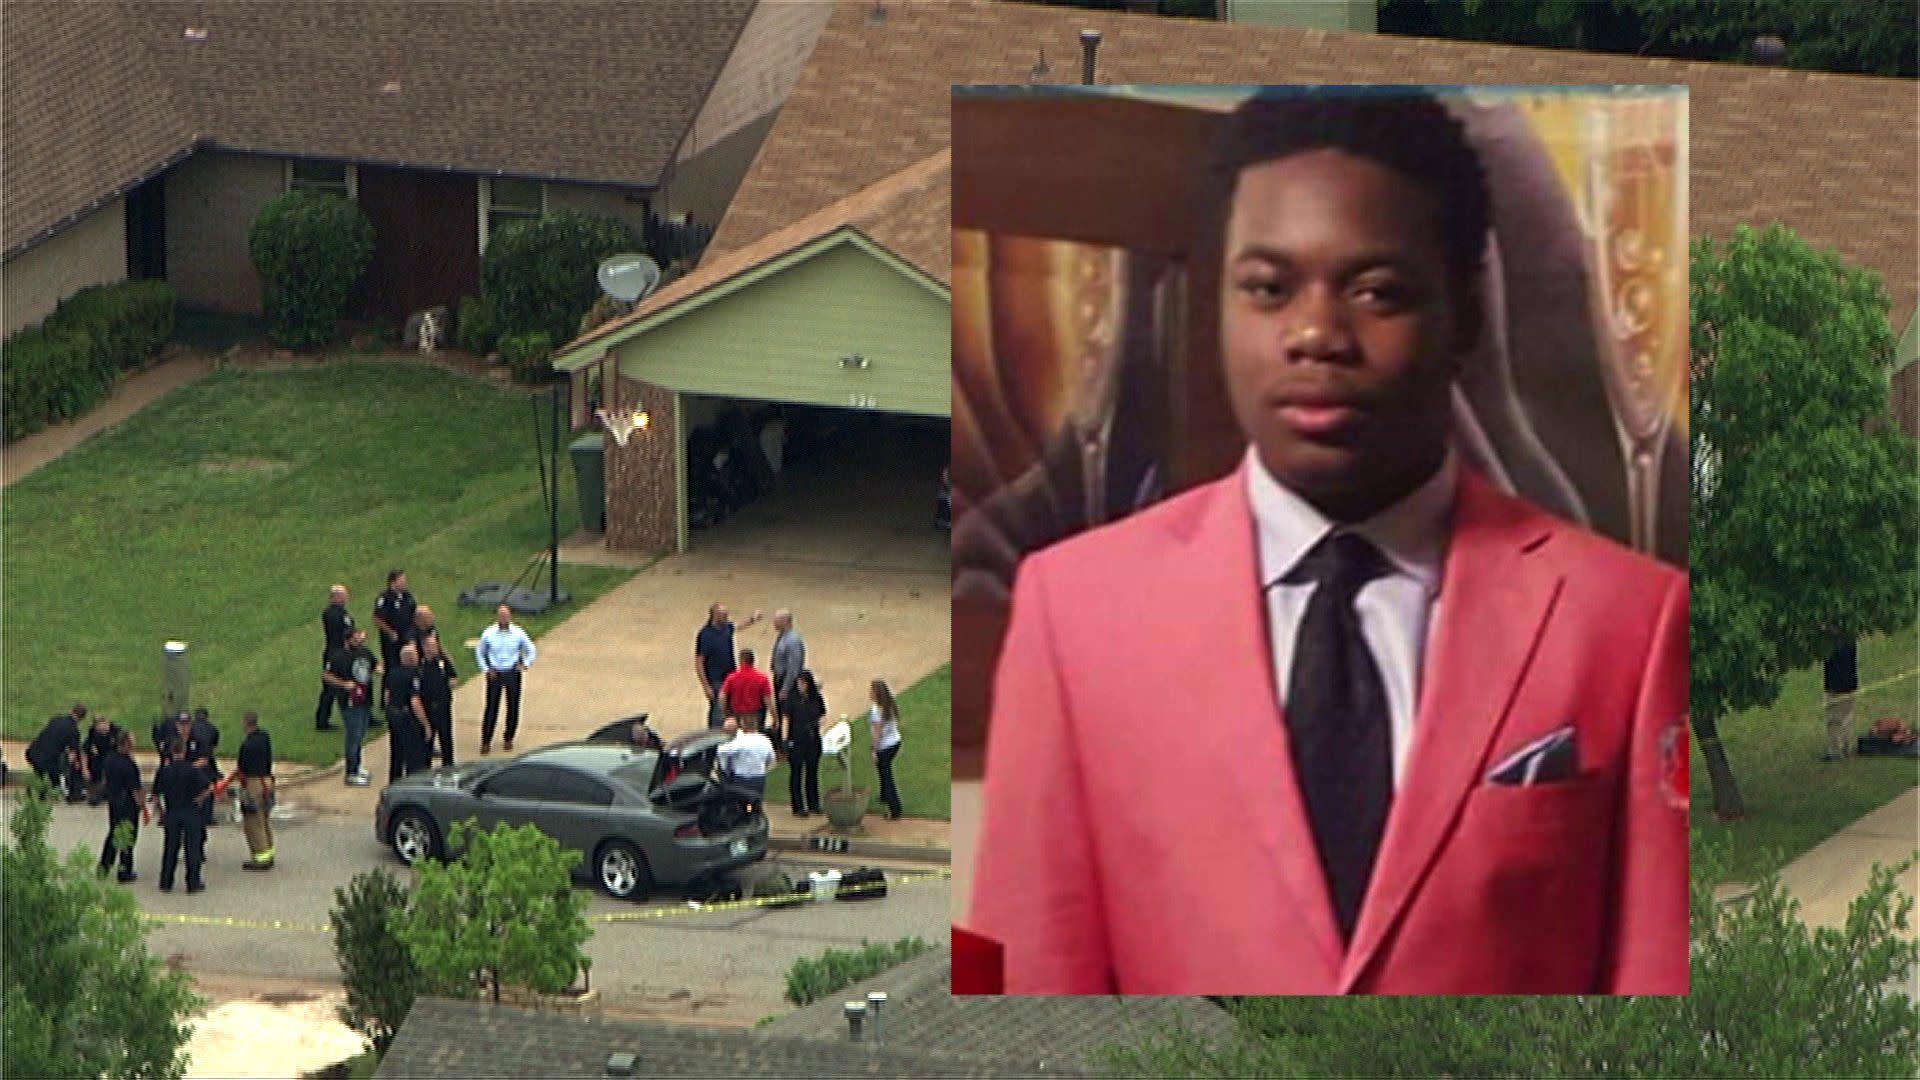 Tennessee deputy celebrating his 26th birthday fatally